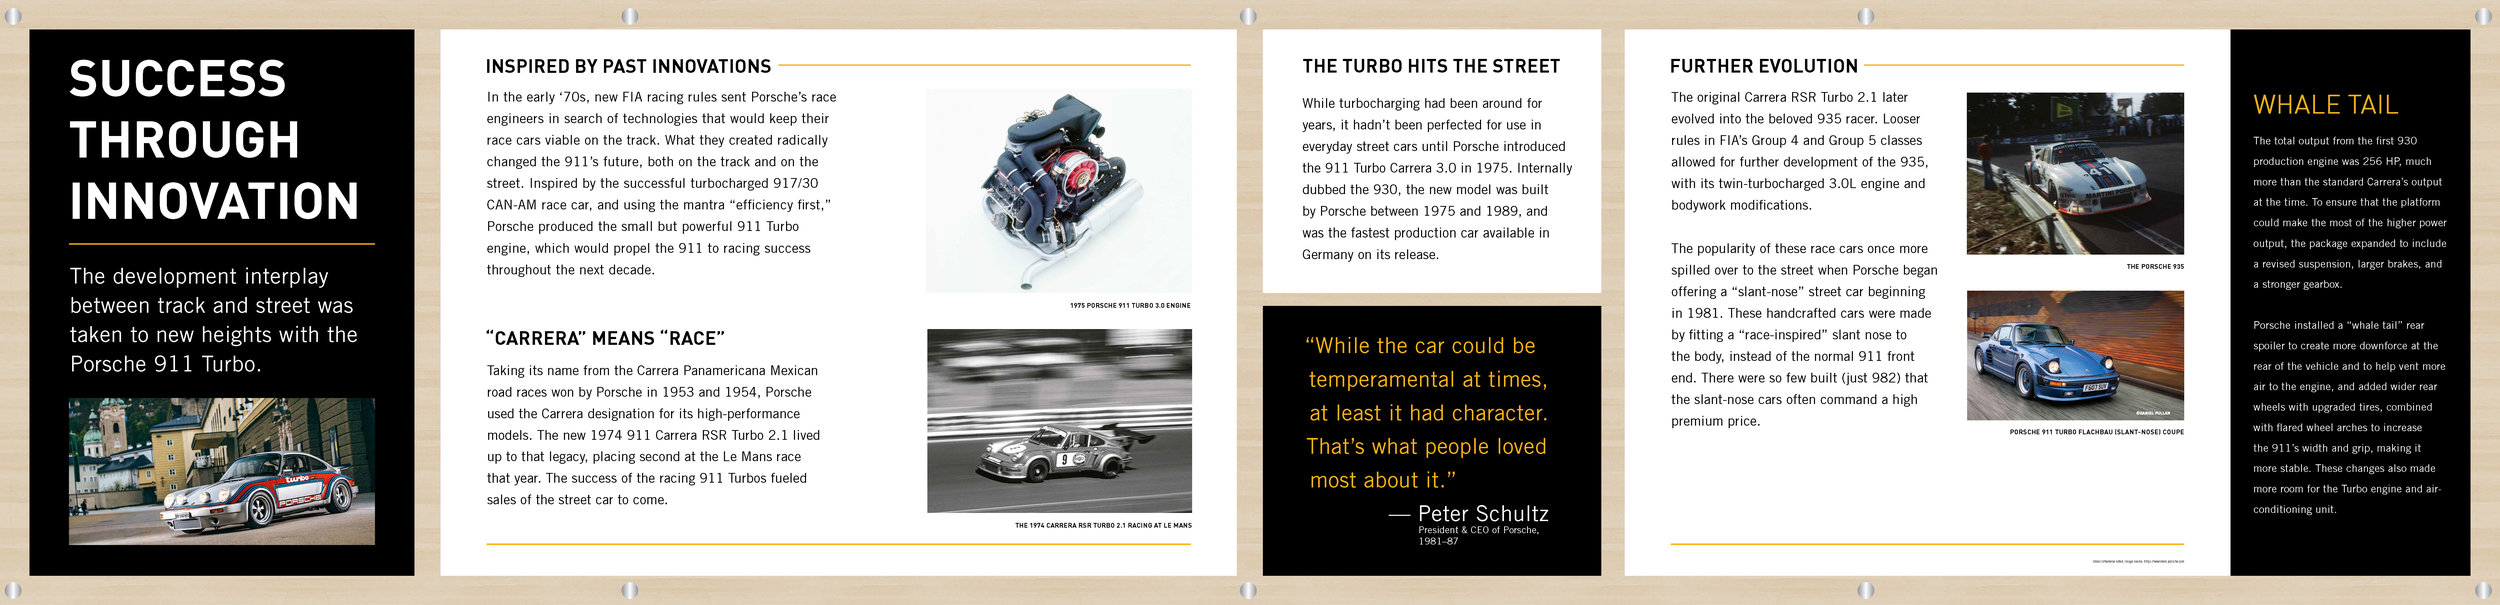 Porsche_Interpretive Panels_v11_Page_3.jpg